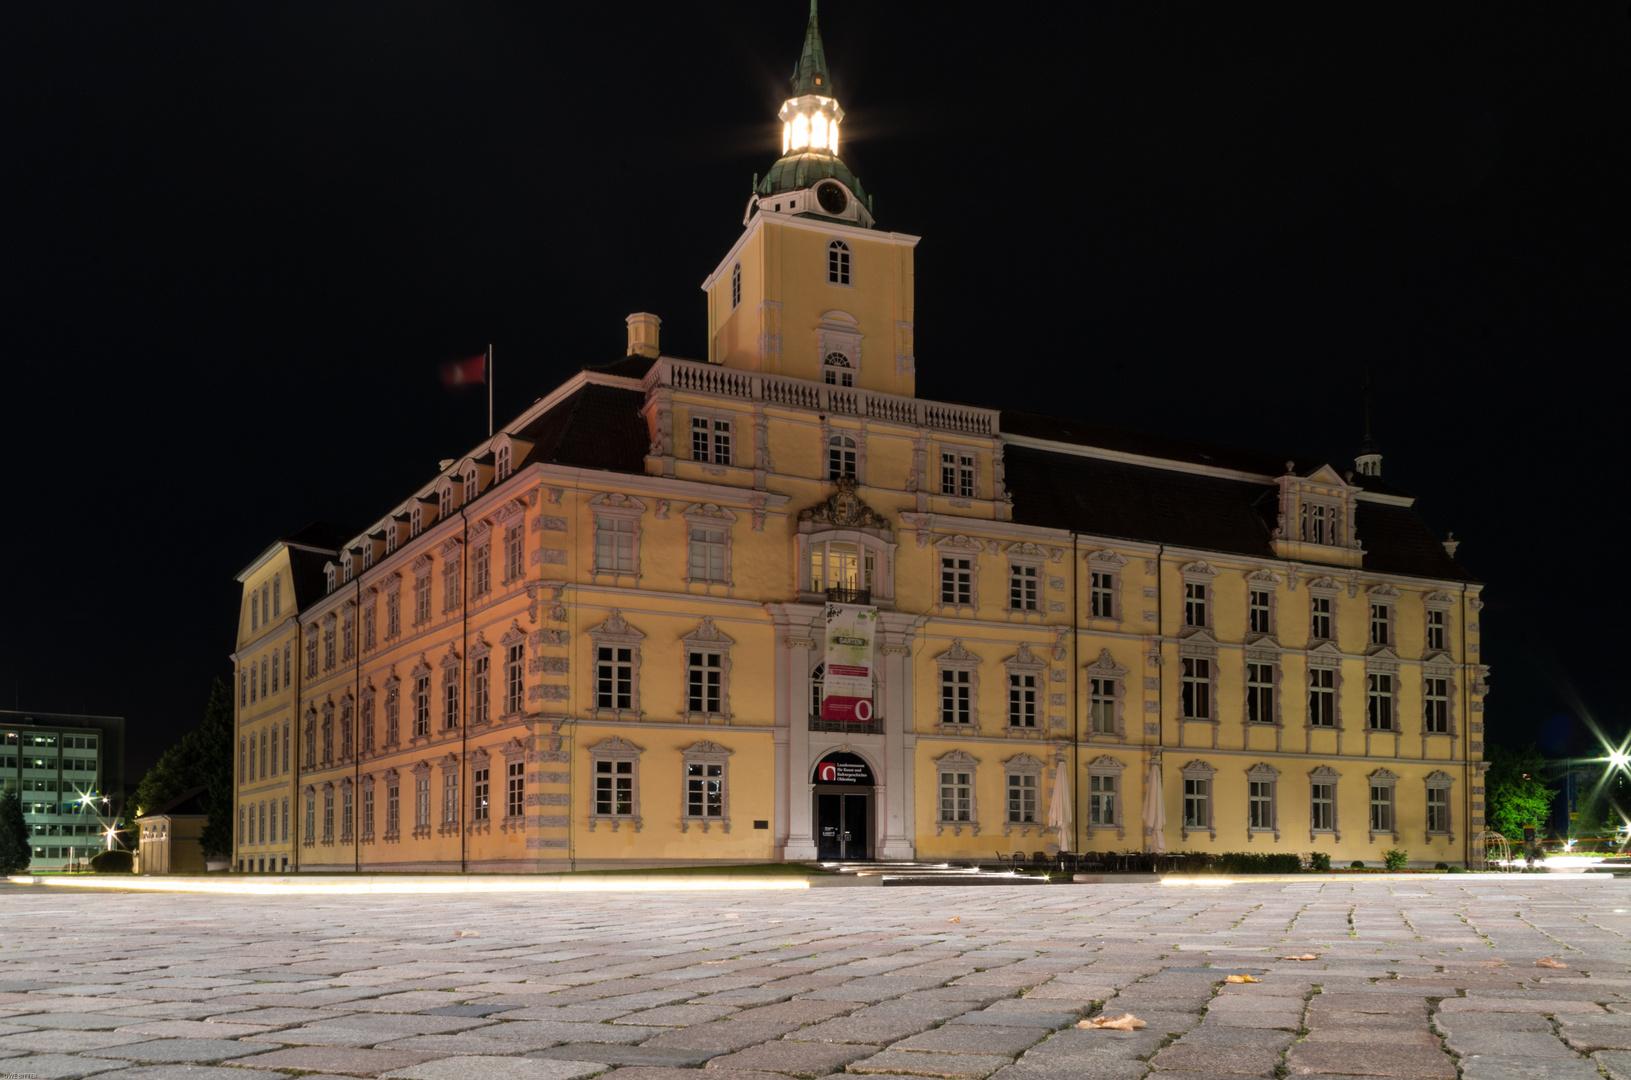 Oldenburger Schloß bei Nacht